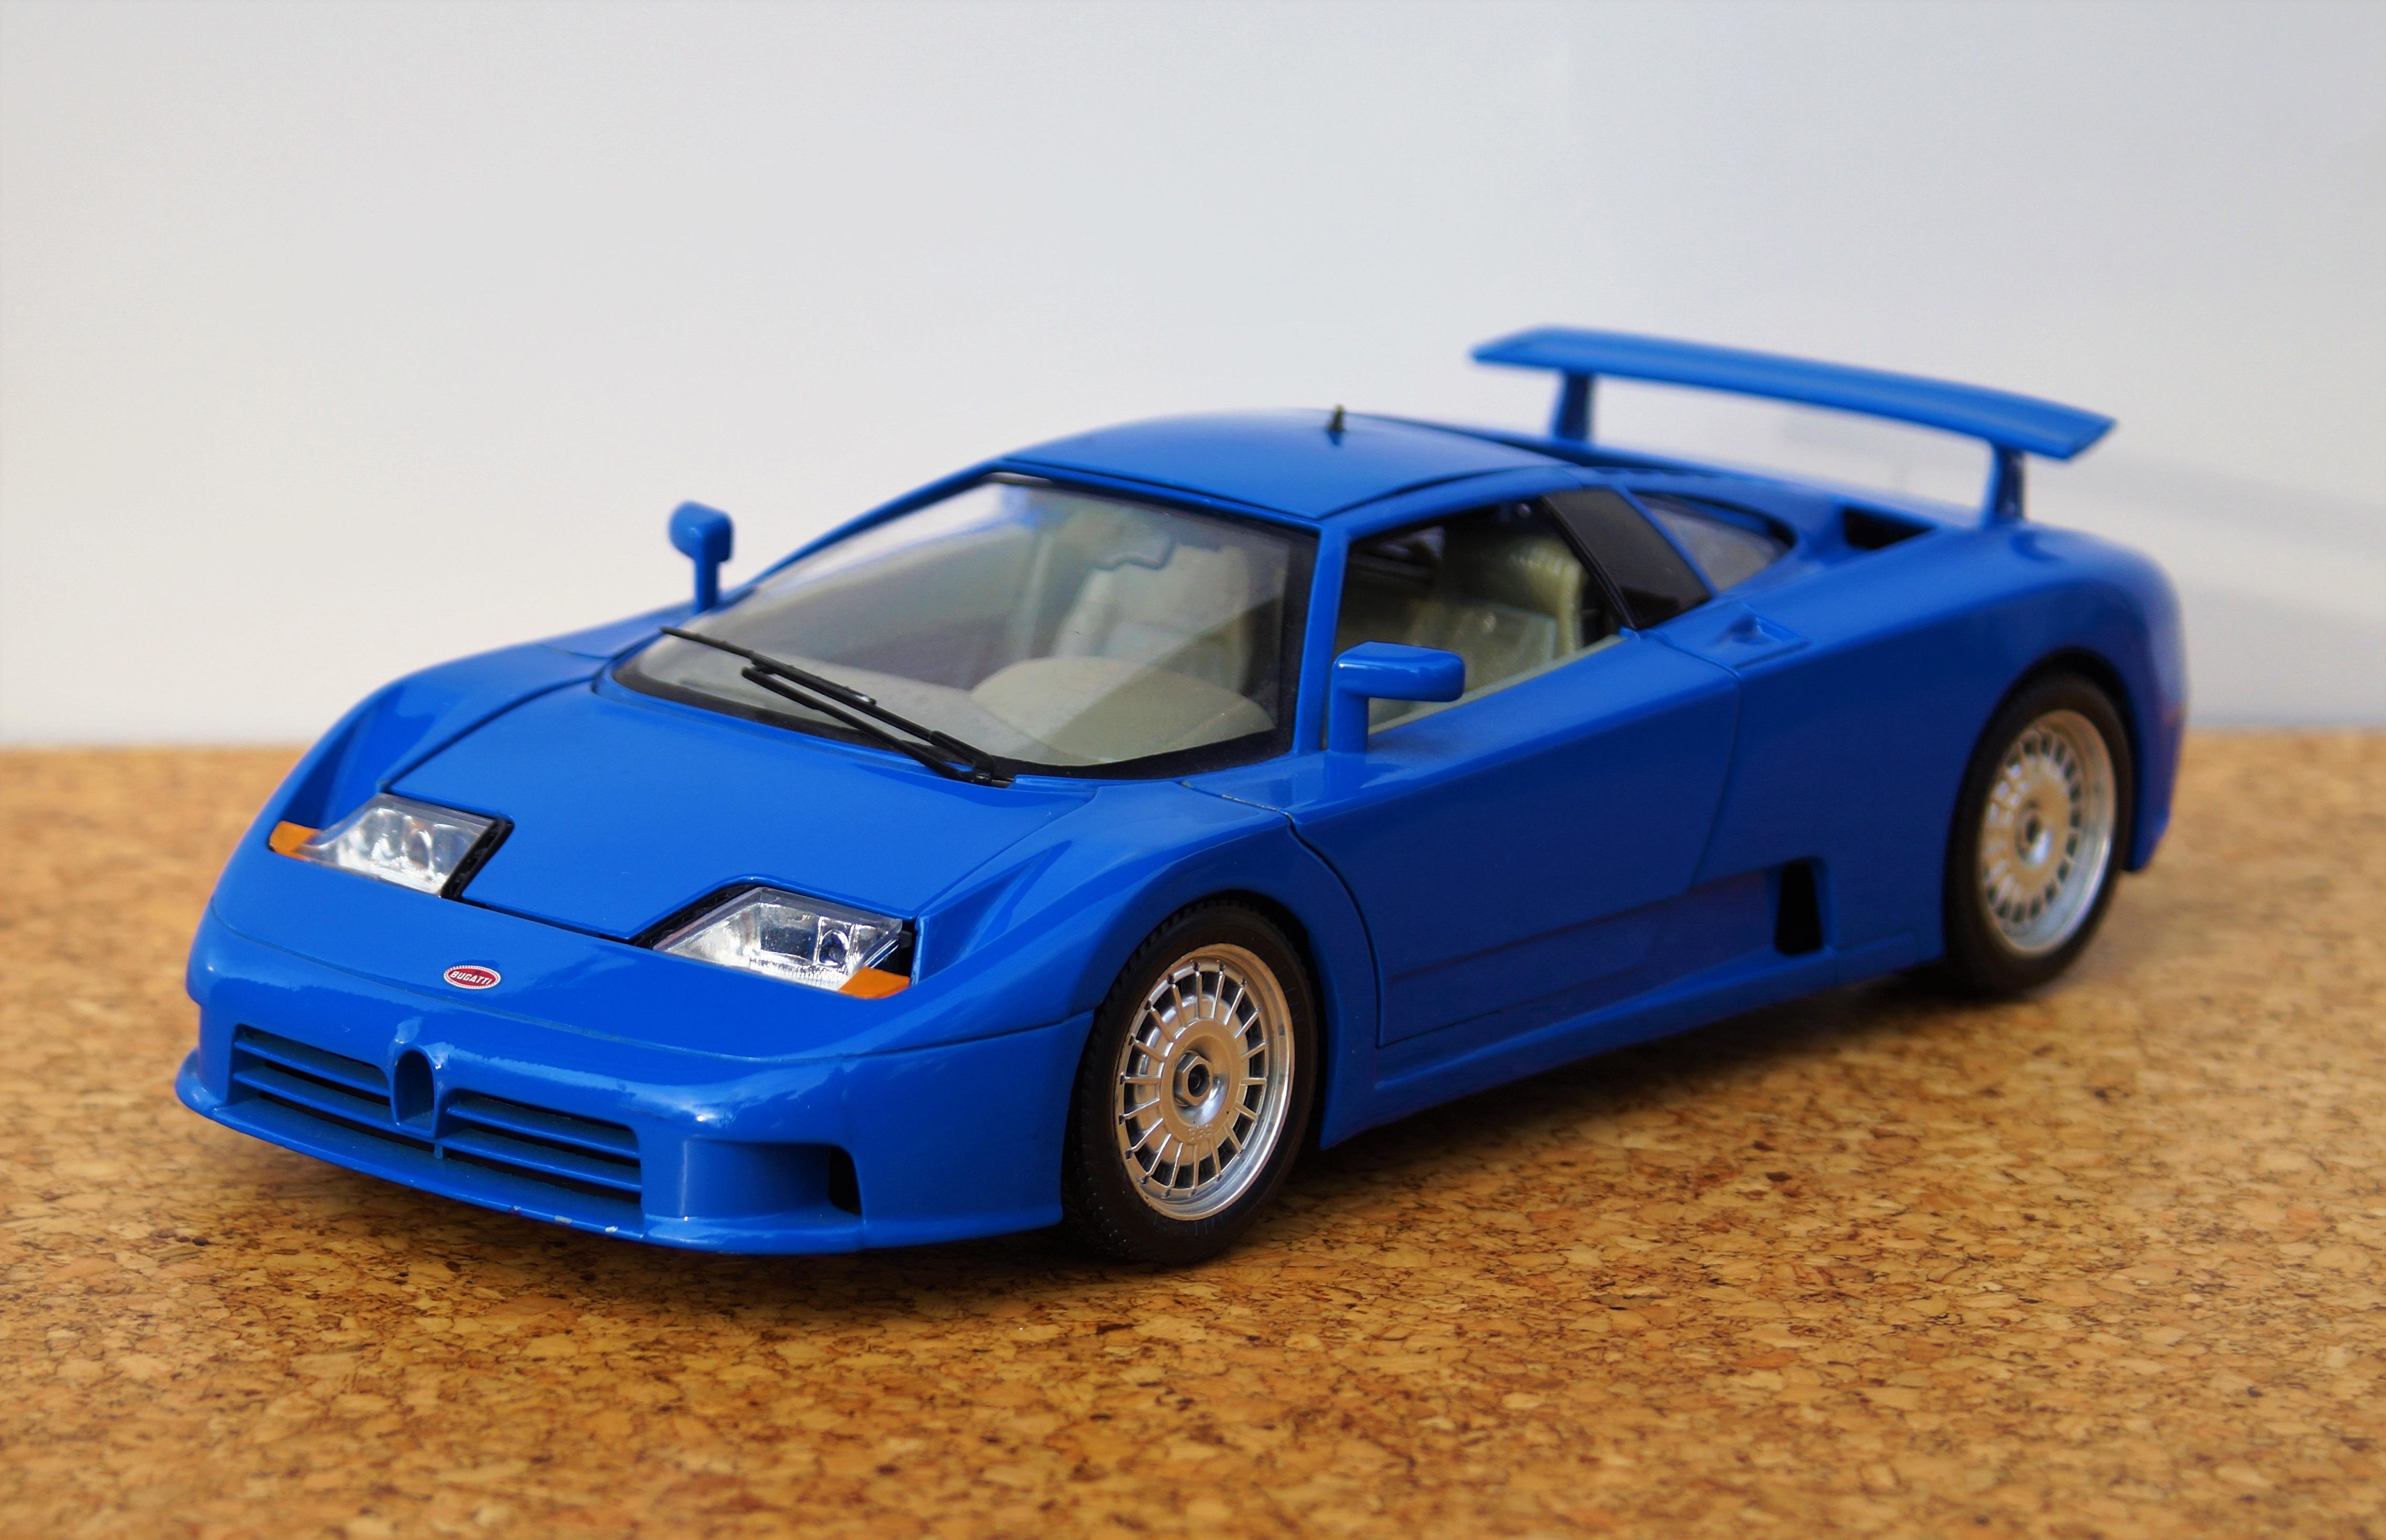 Free Images Old Auto Blue Sports Car Race Car Supercar